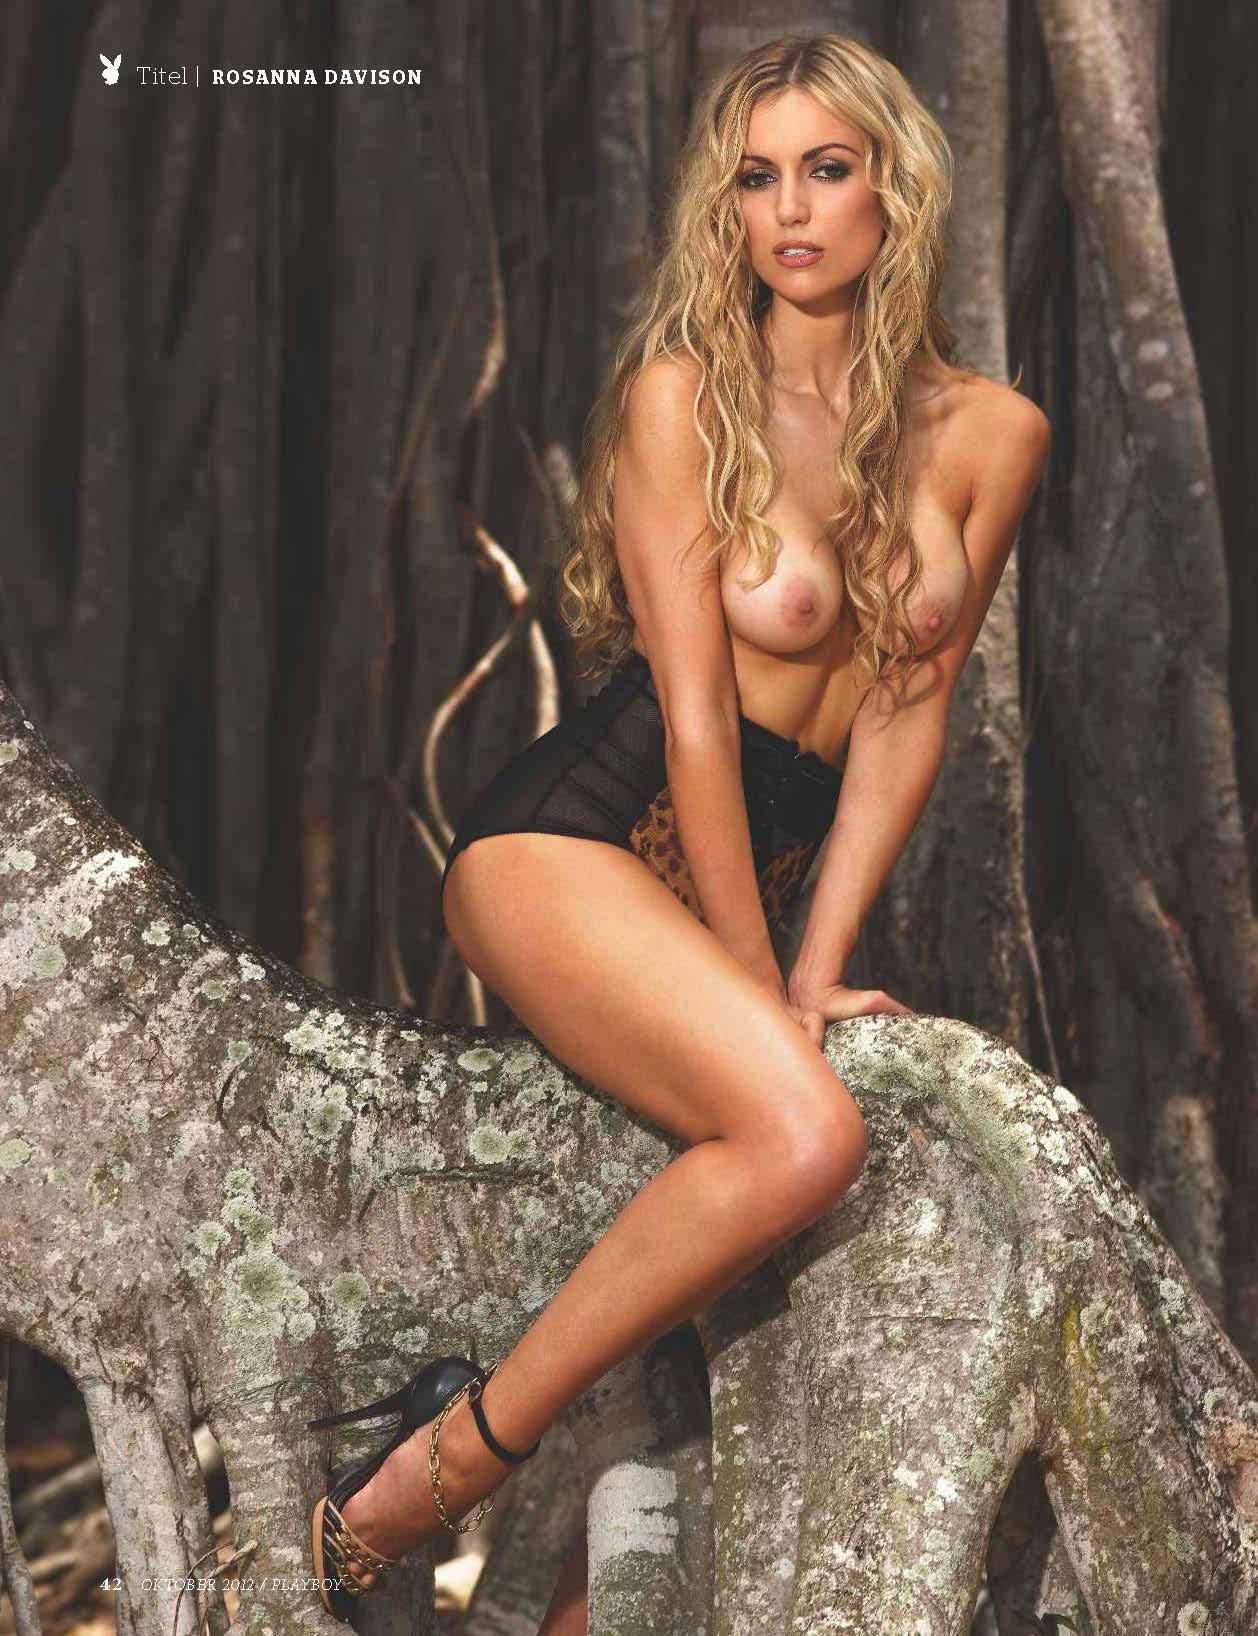 23086_septimiu29_RosannaDavison_PlayboyGermany_Oct201214_123_144lo.jpg